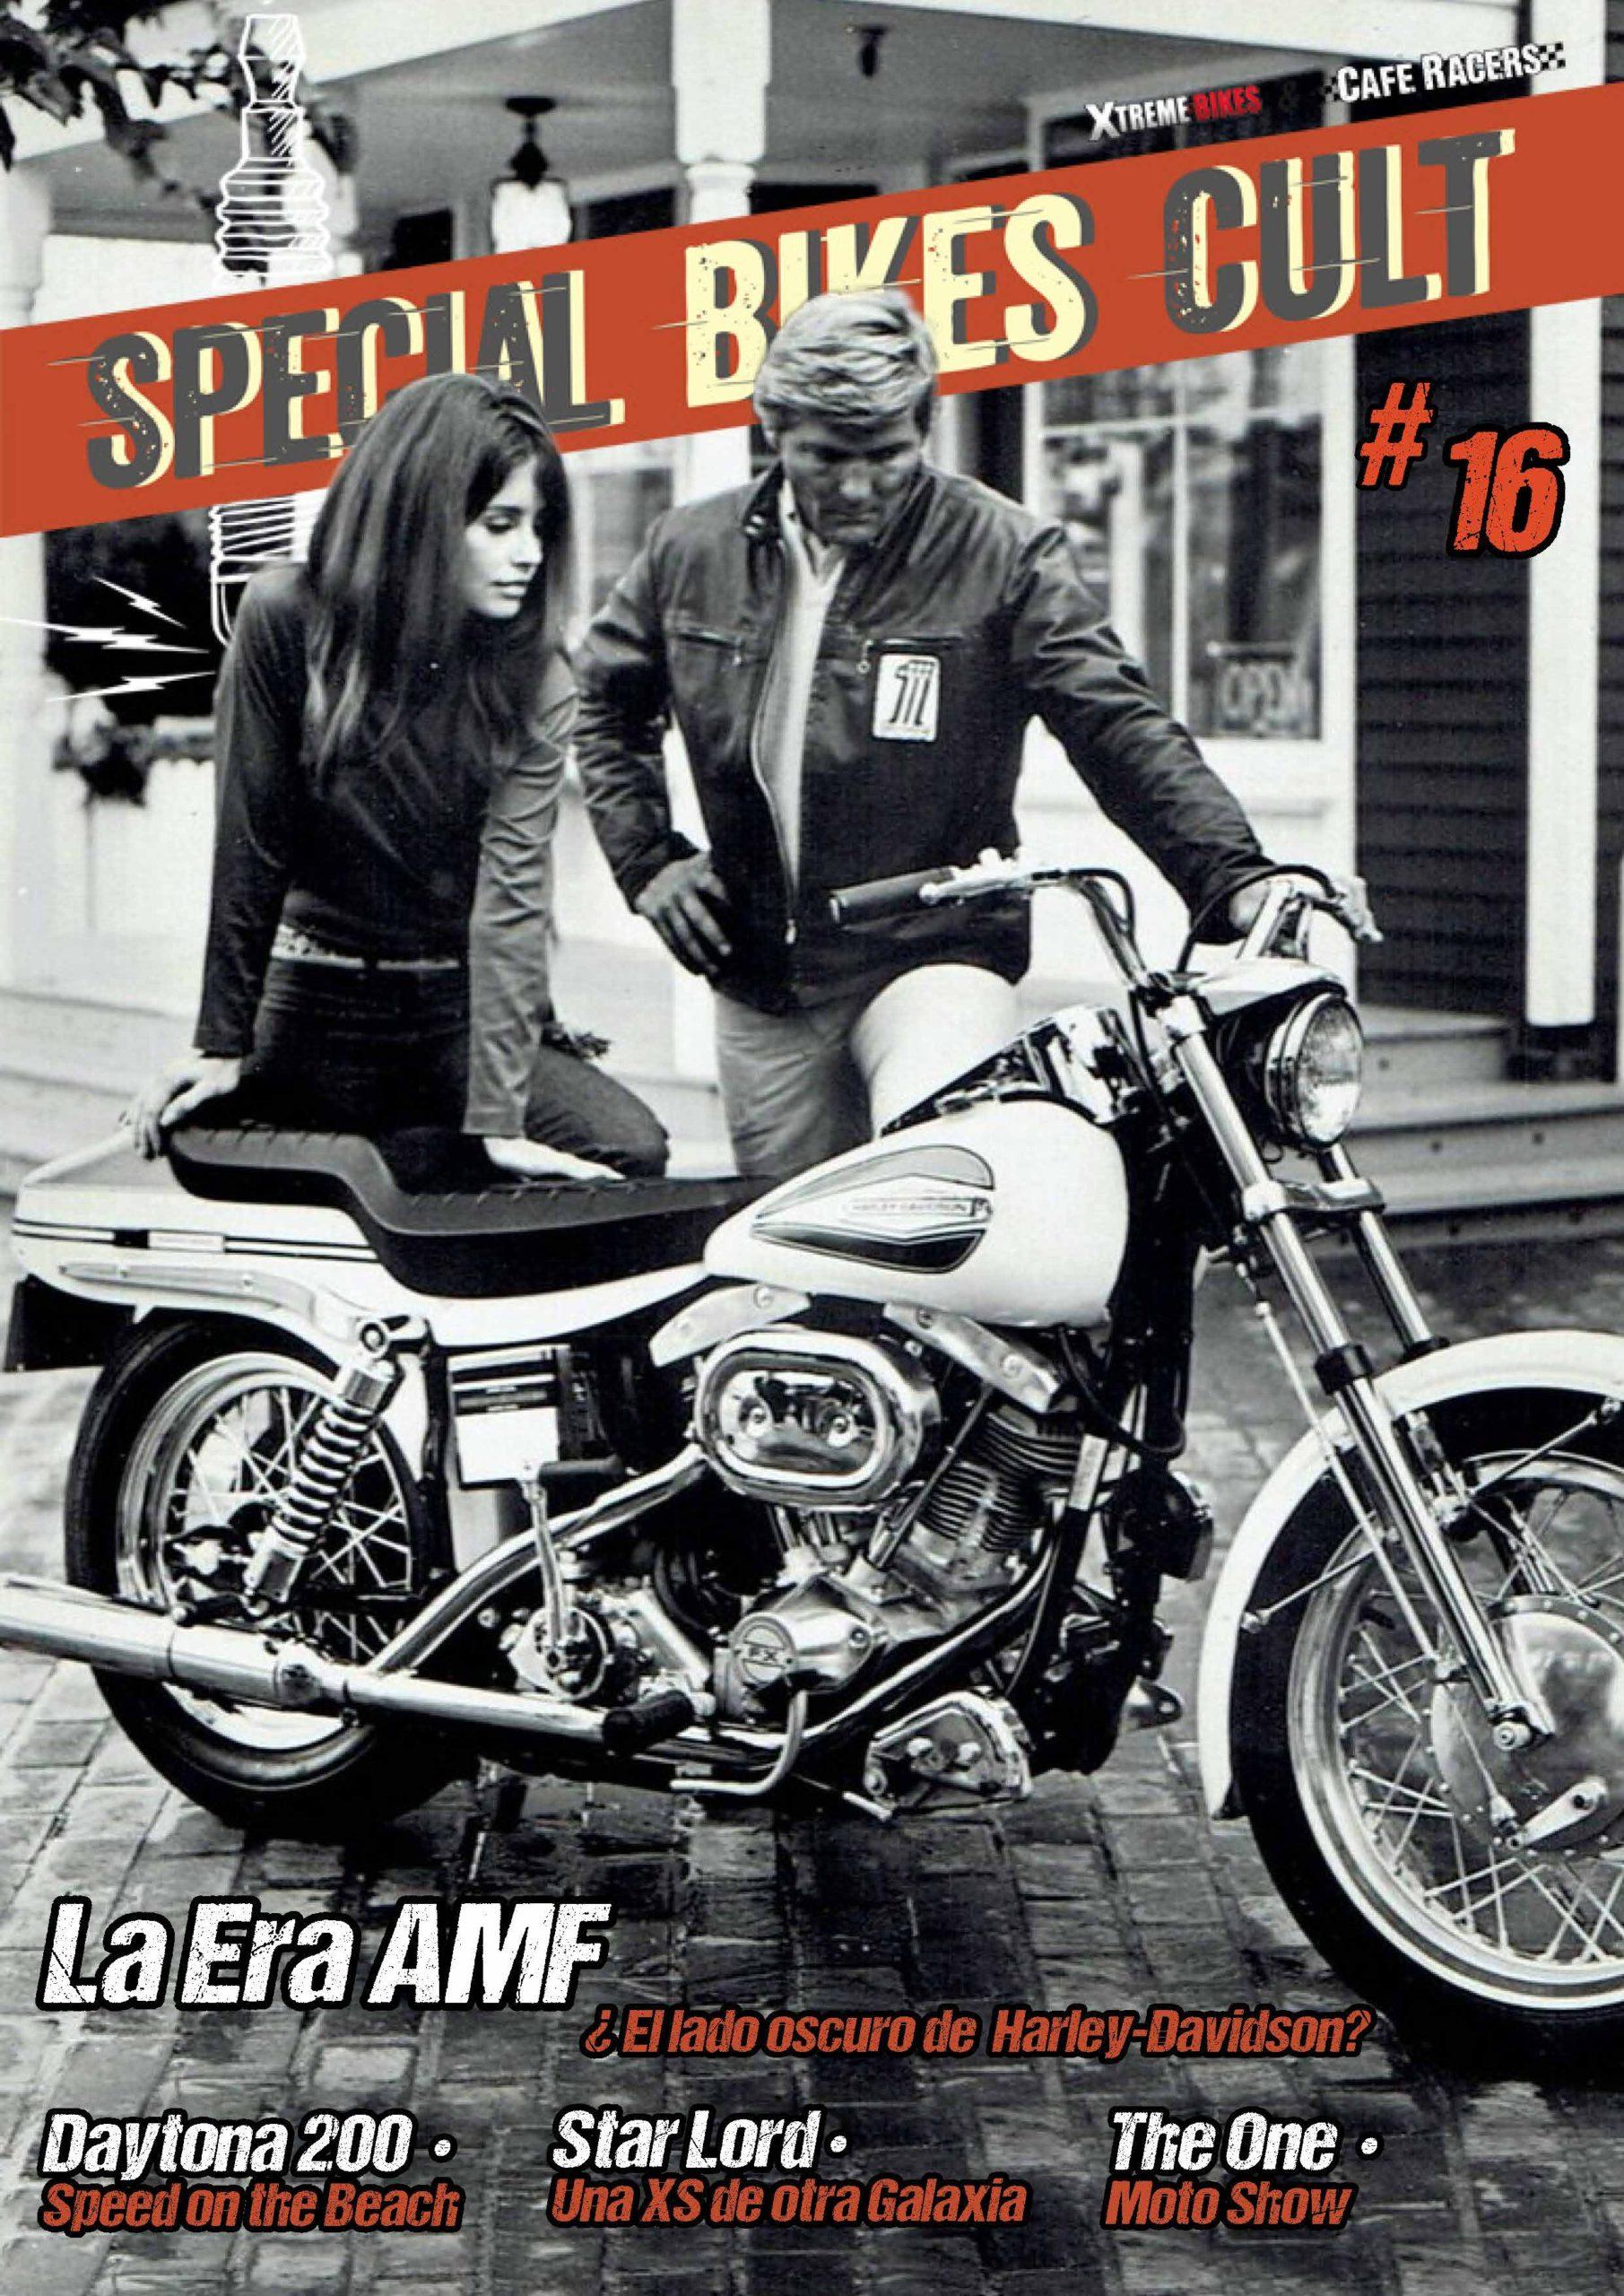 Special Bikes Cult #16